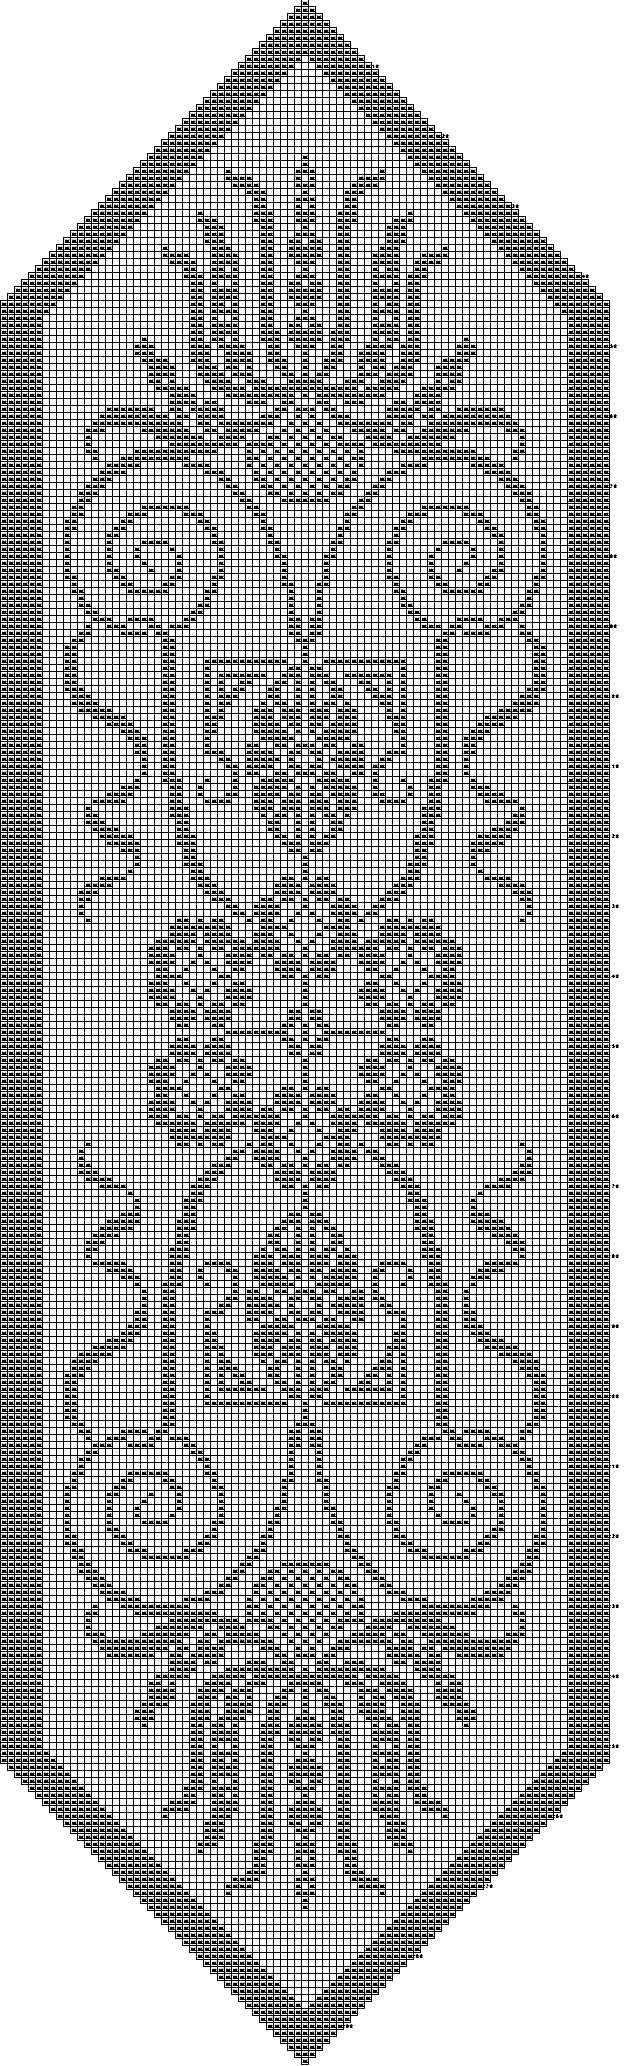 Filet Crochet Denenecek Projeler Pinterest Oval Doily Diagram Patterns Charts